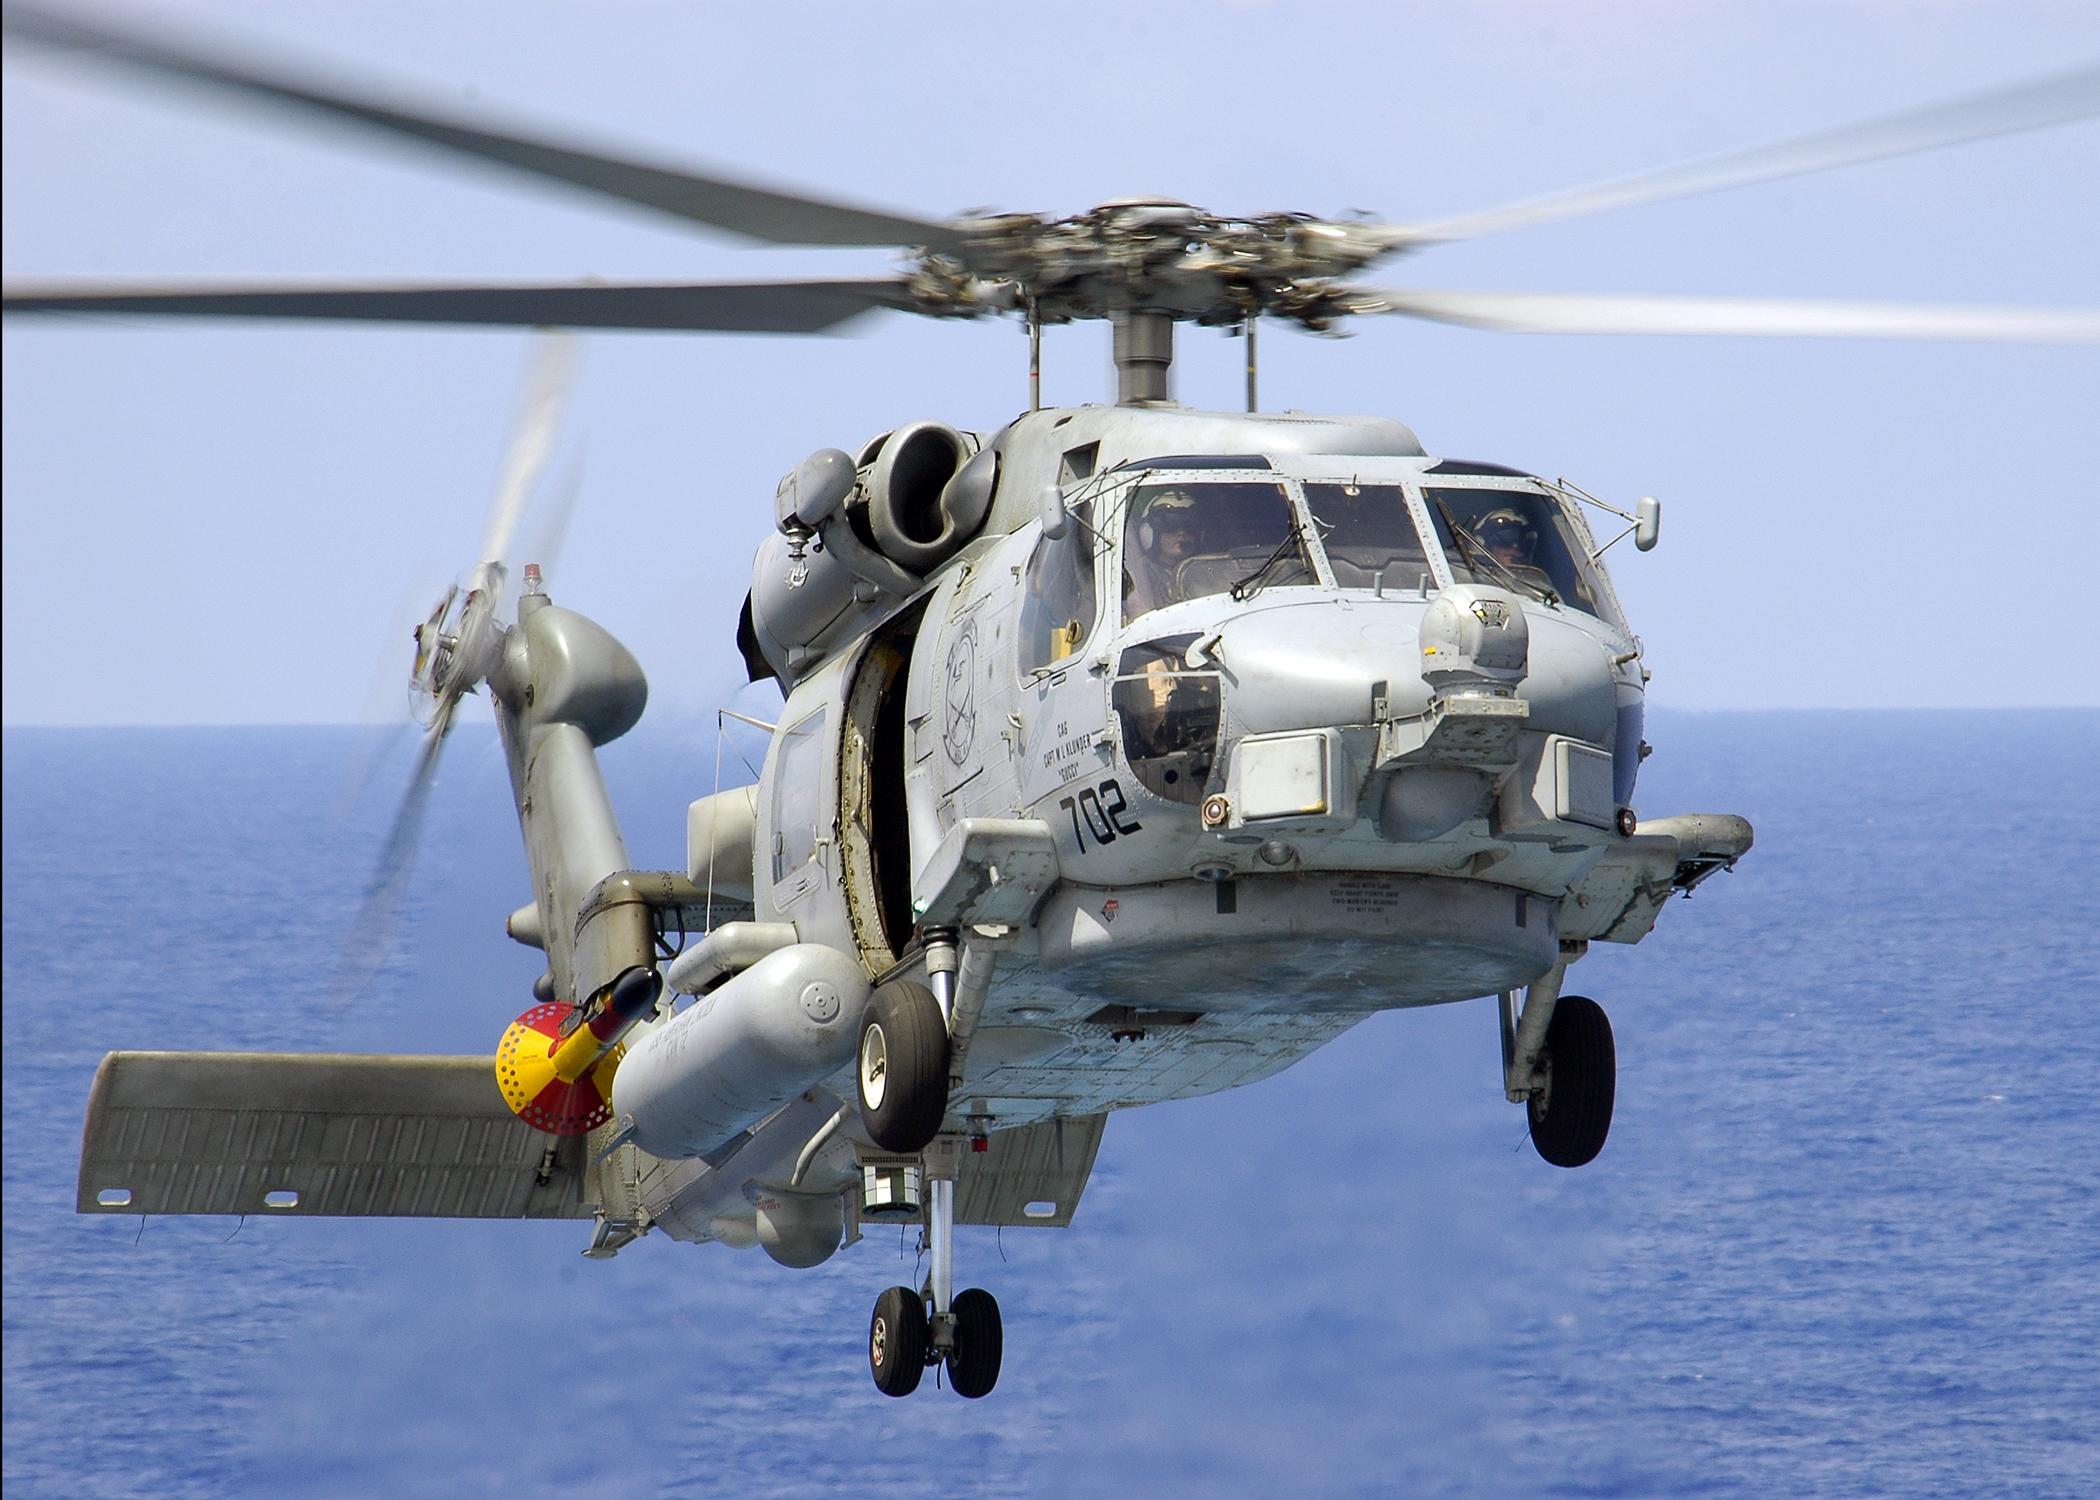 Sikorsky SH-60 Seahawk - Wikipedia